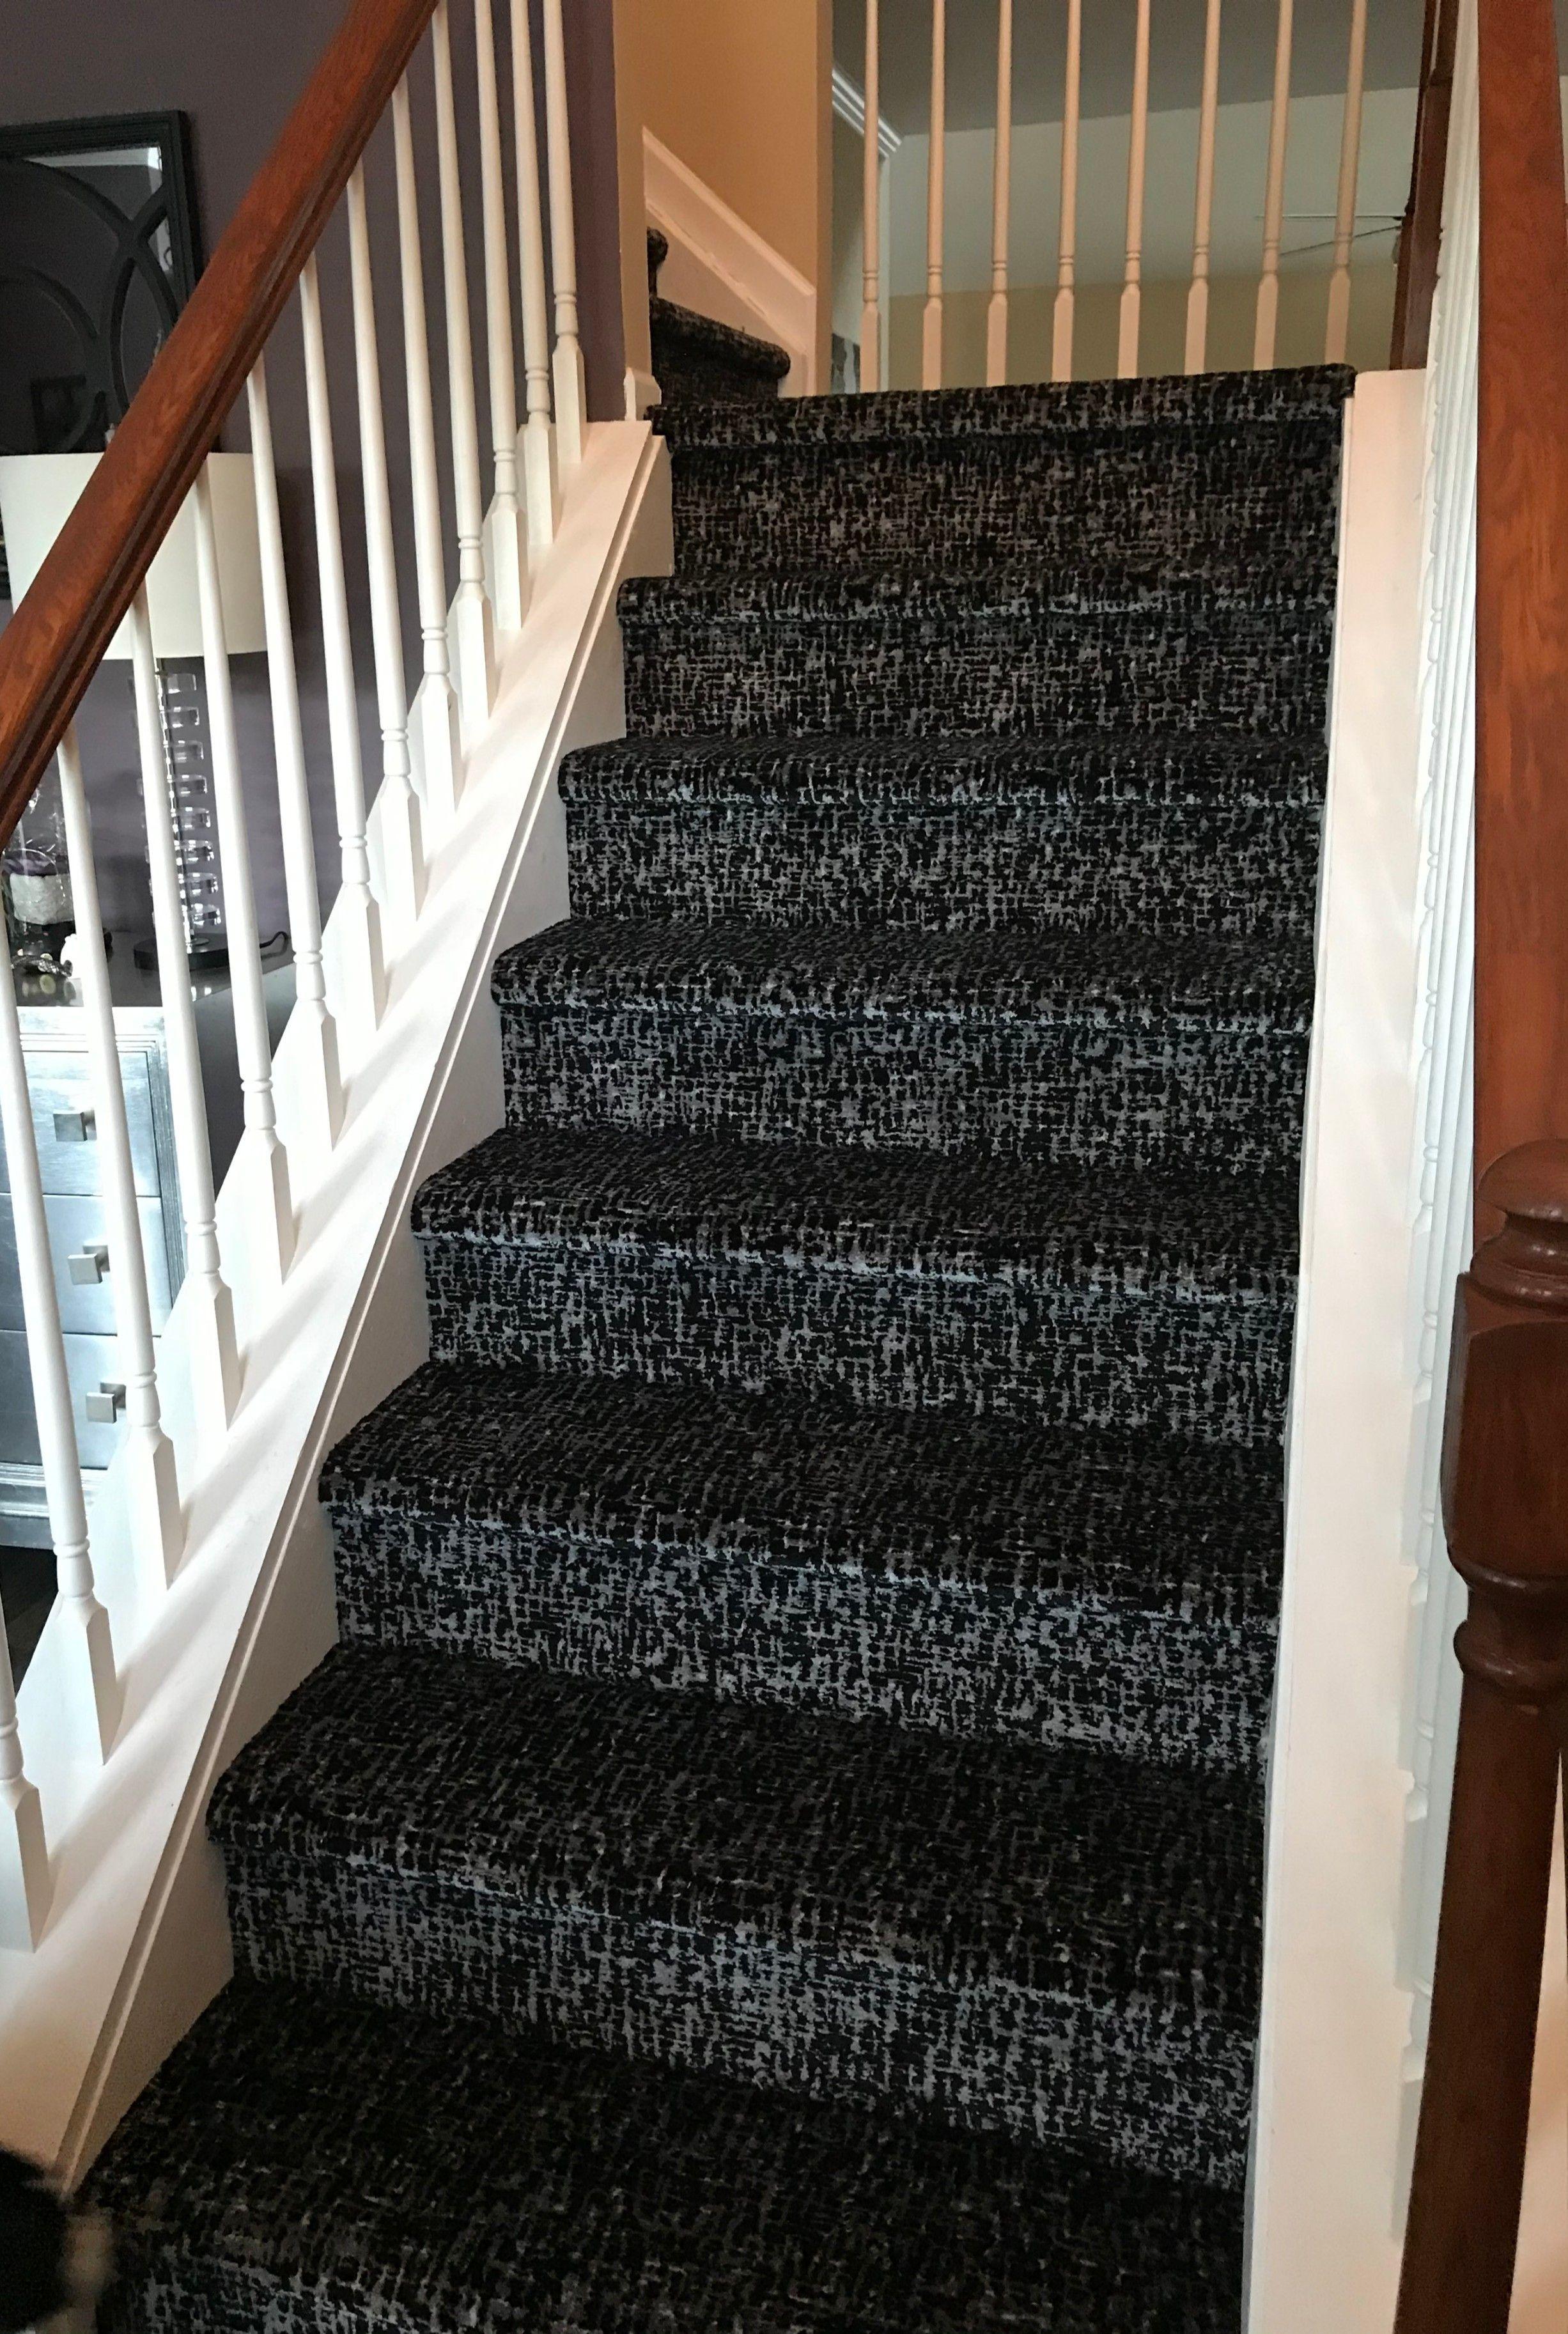 A Beautiful Stairway Transformation From Hardwood To Carpet Featuring Kane S Retro Lafayette Collection Kane Carpet Carpet Animal Print Rug